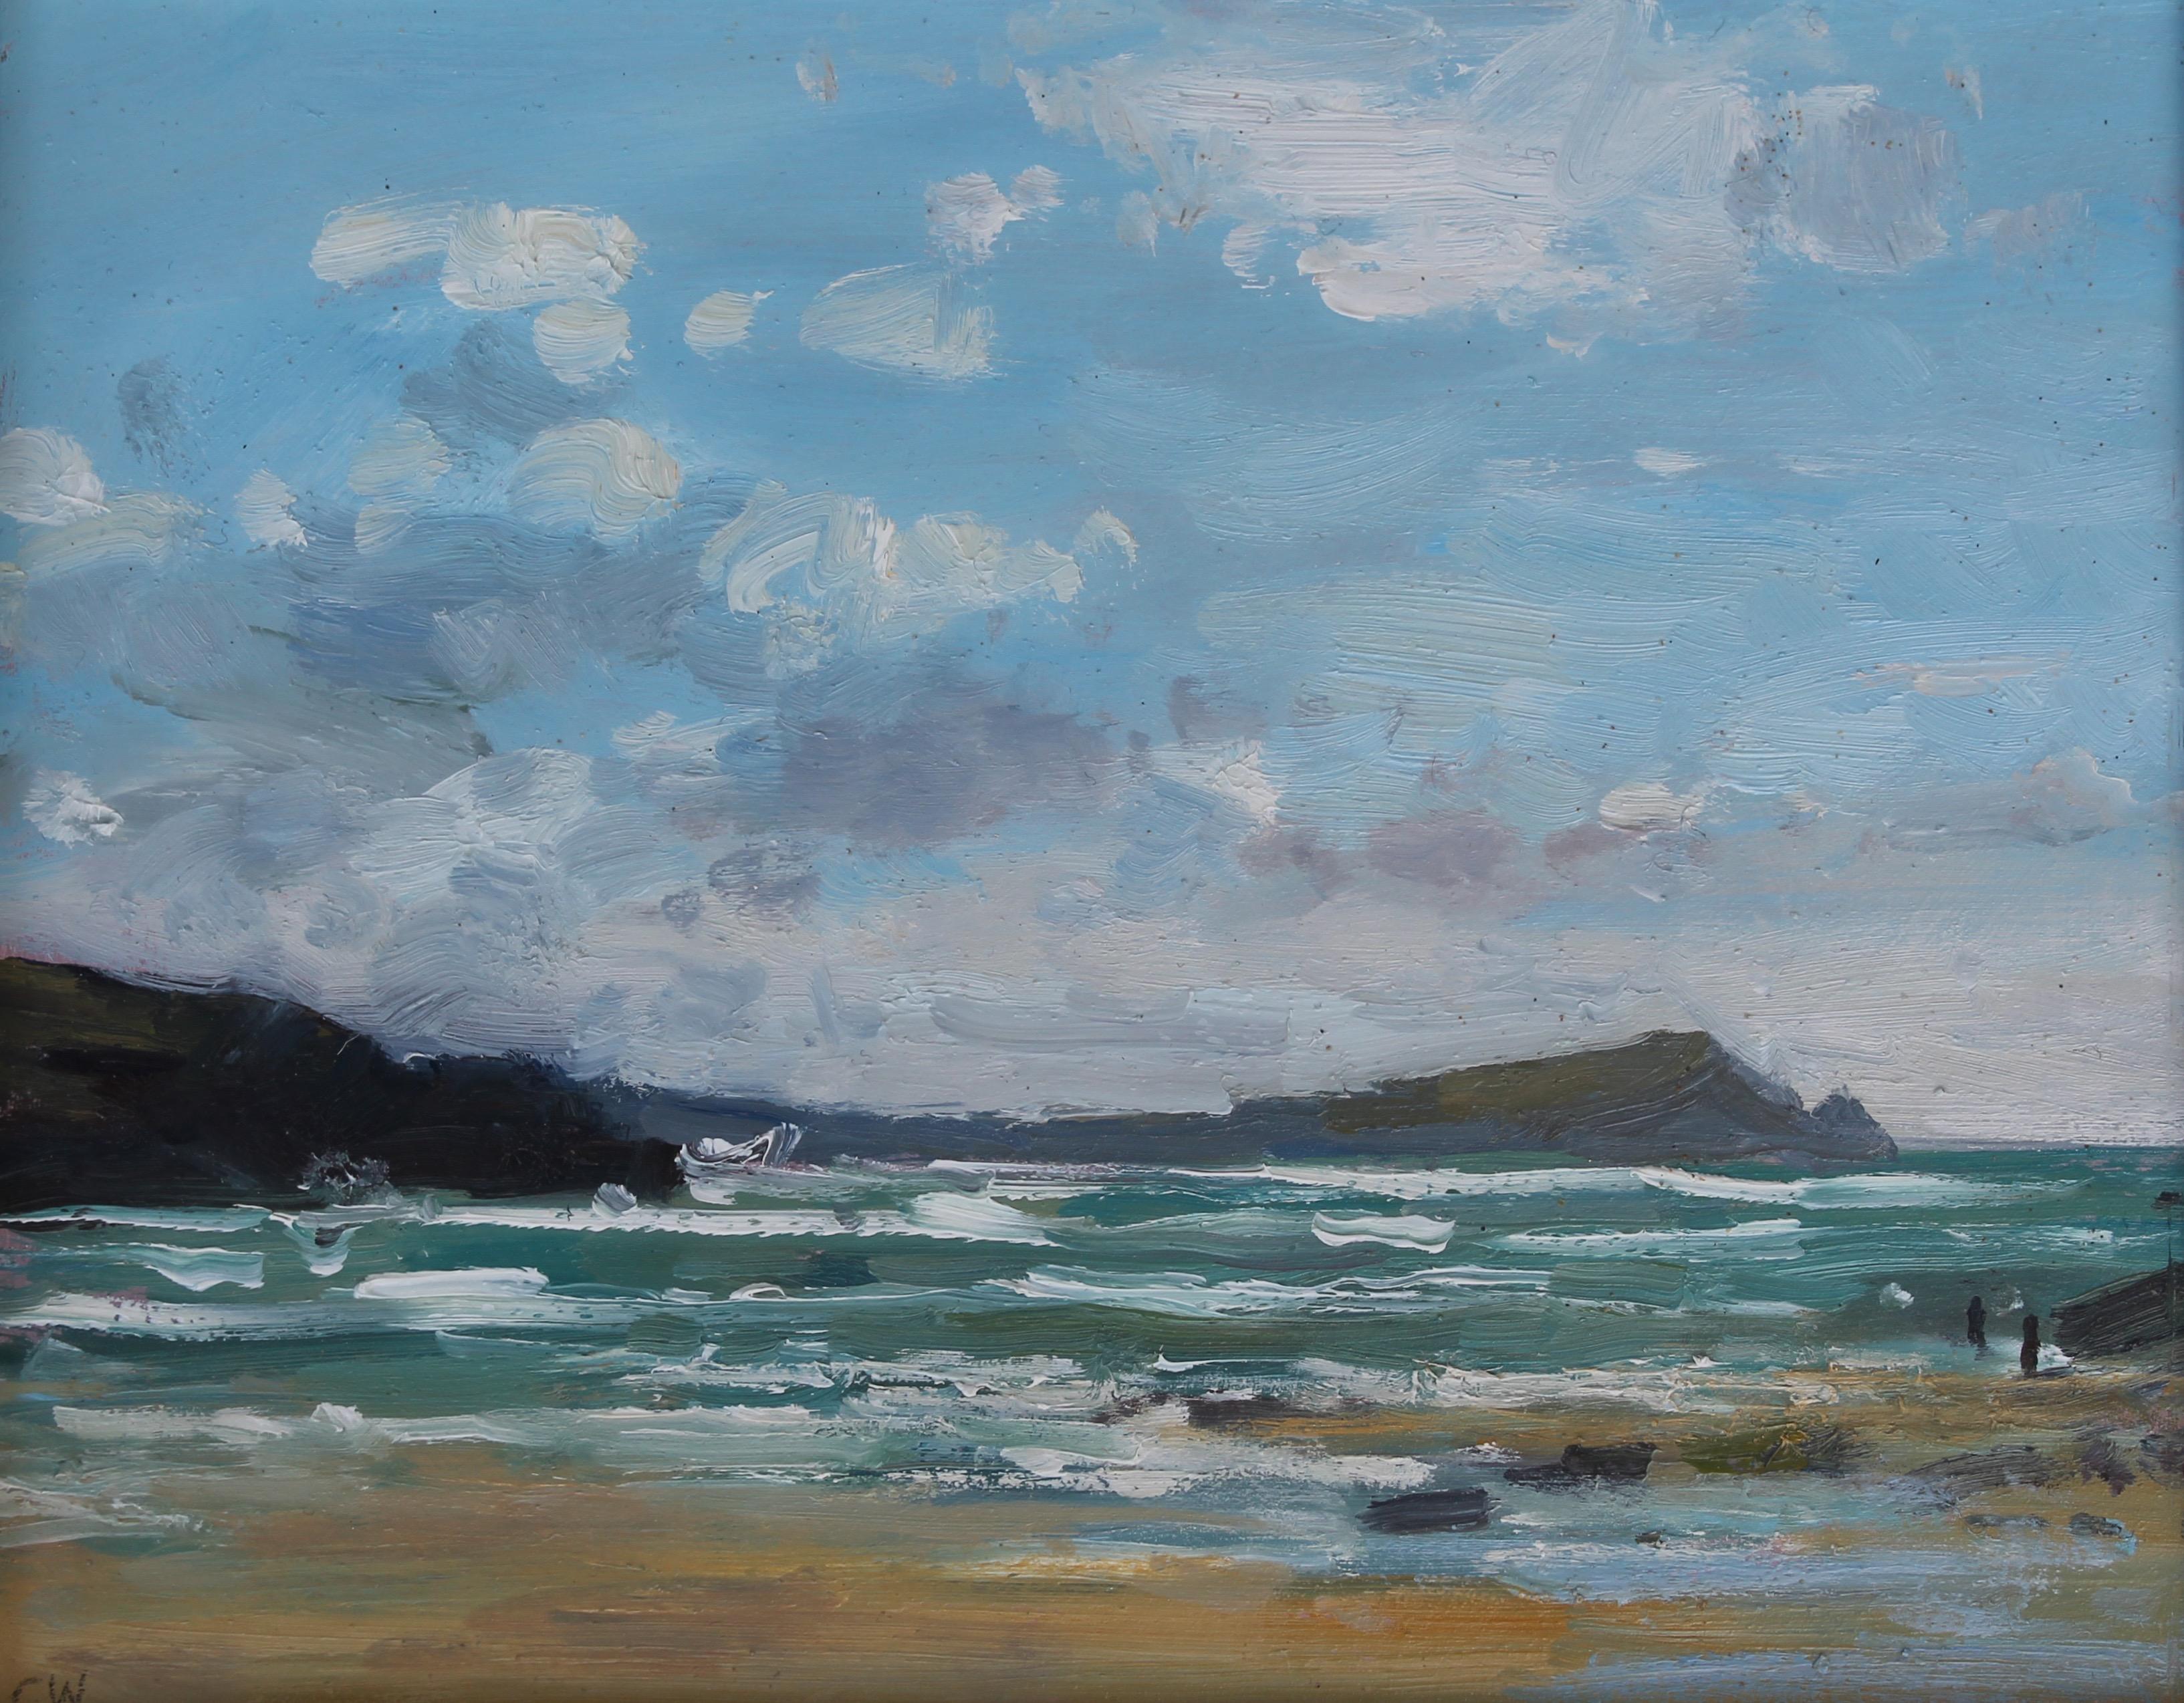 Incoming tide, Porth Beach